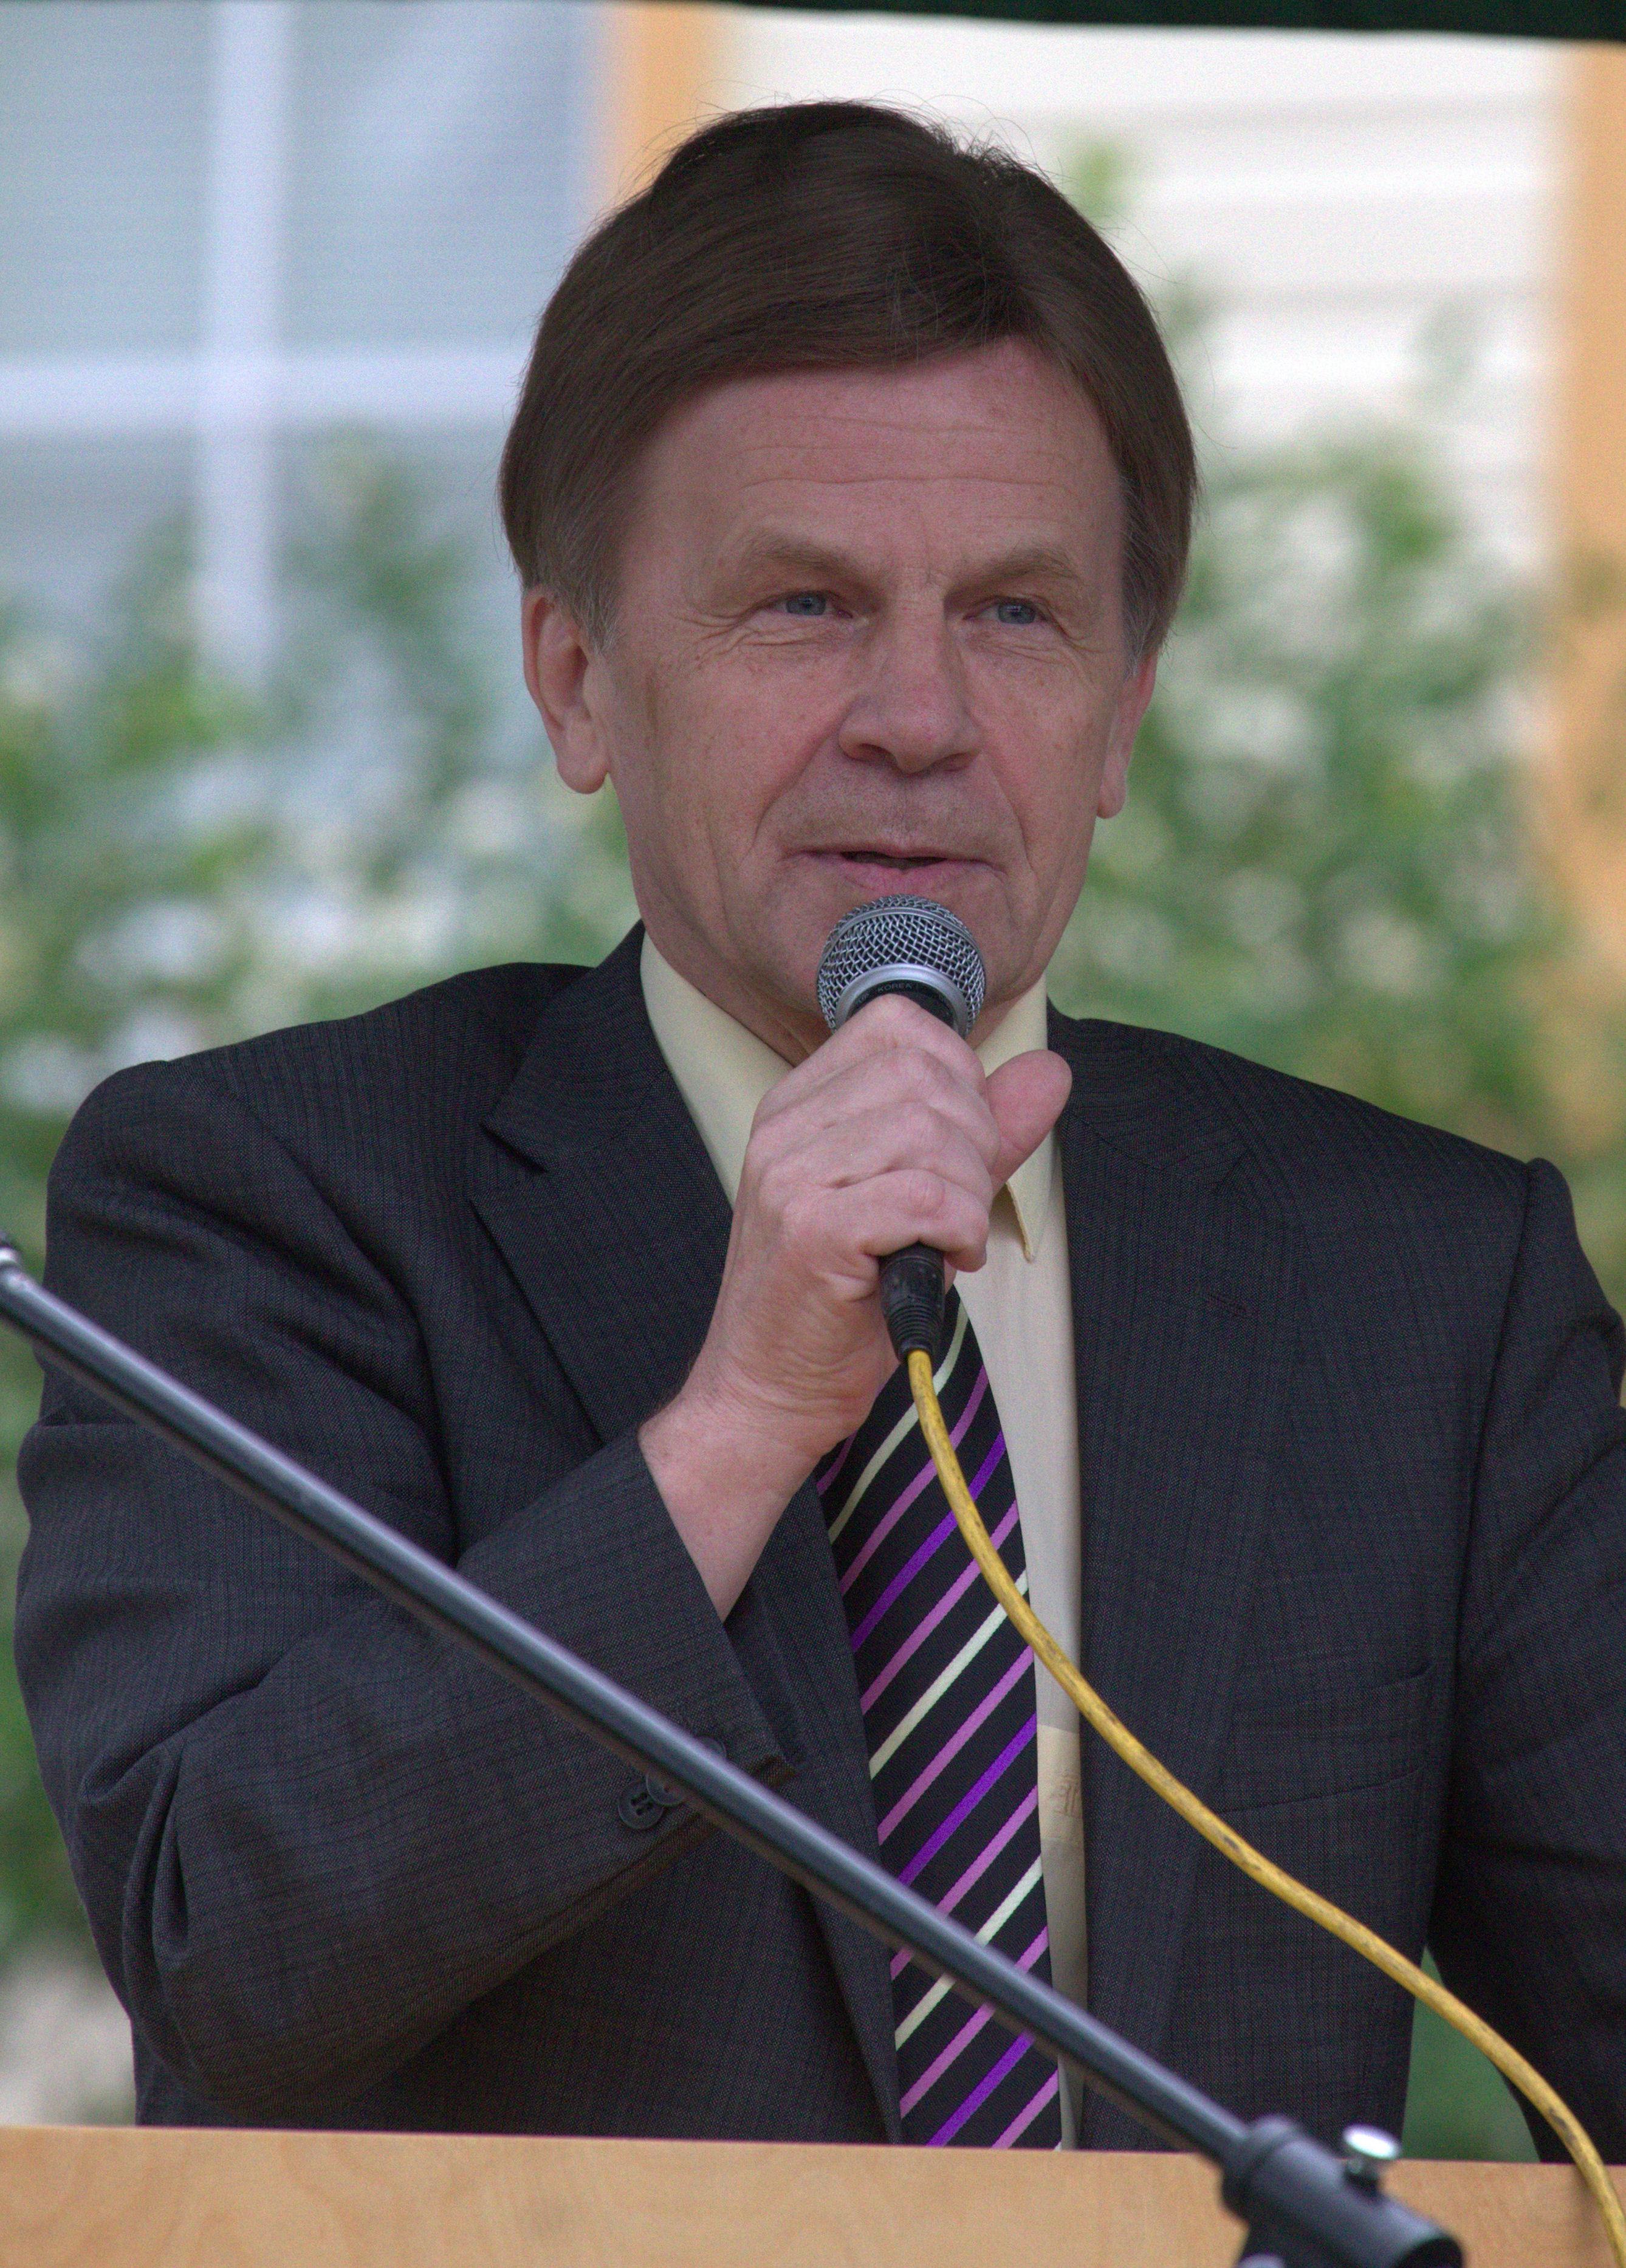 Pekkarinen